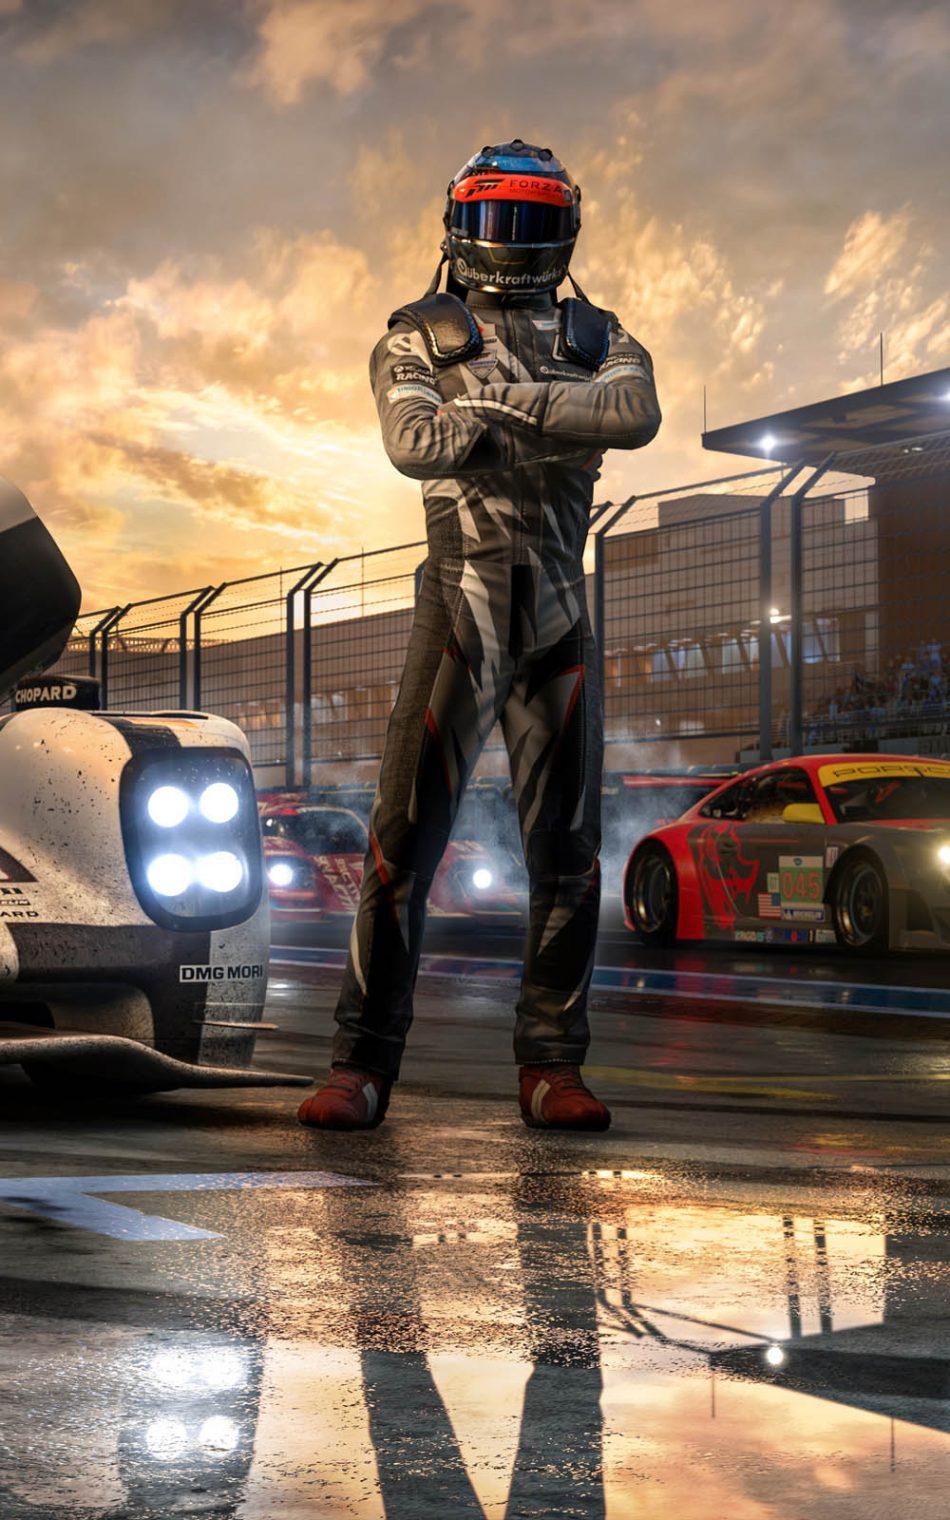 Forza Motorsport 7 Game 4k Ultra Hd Mobile Wallpaper